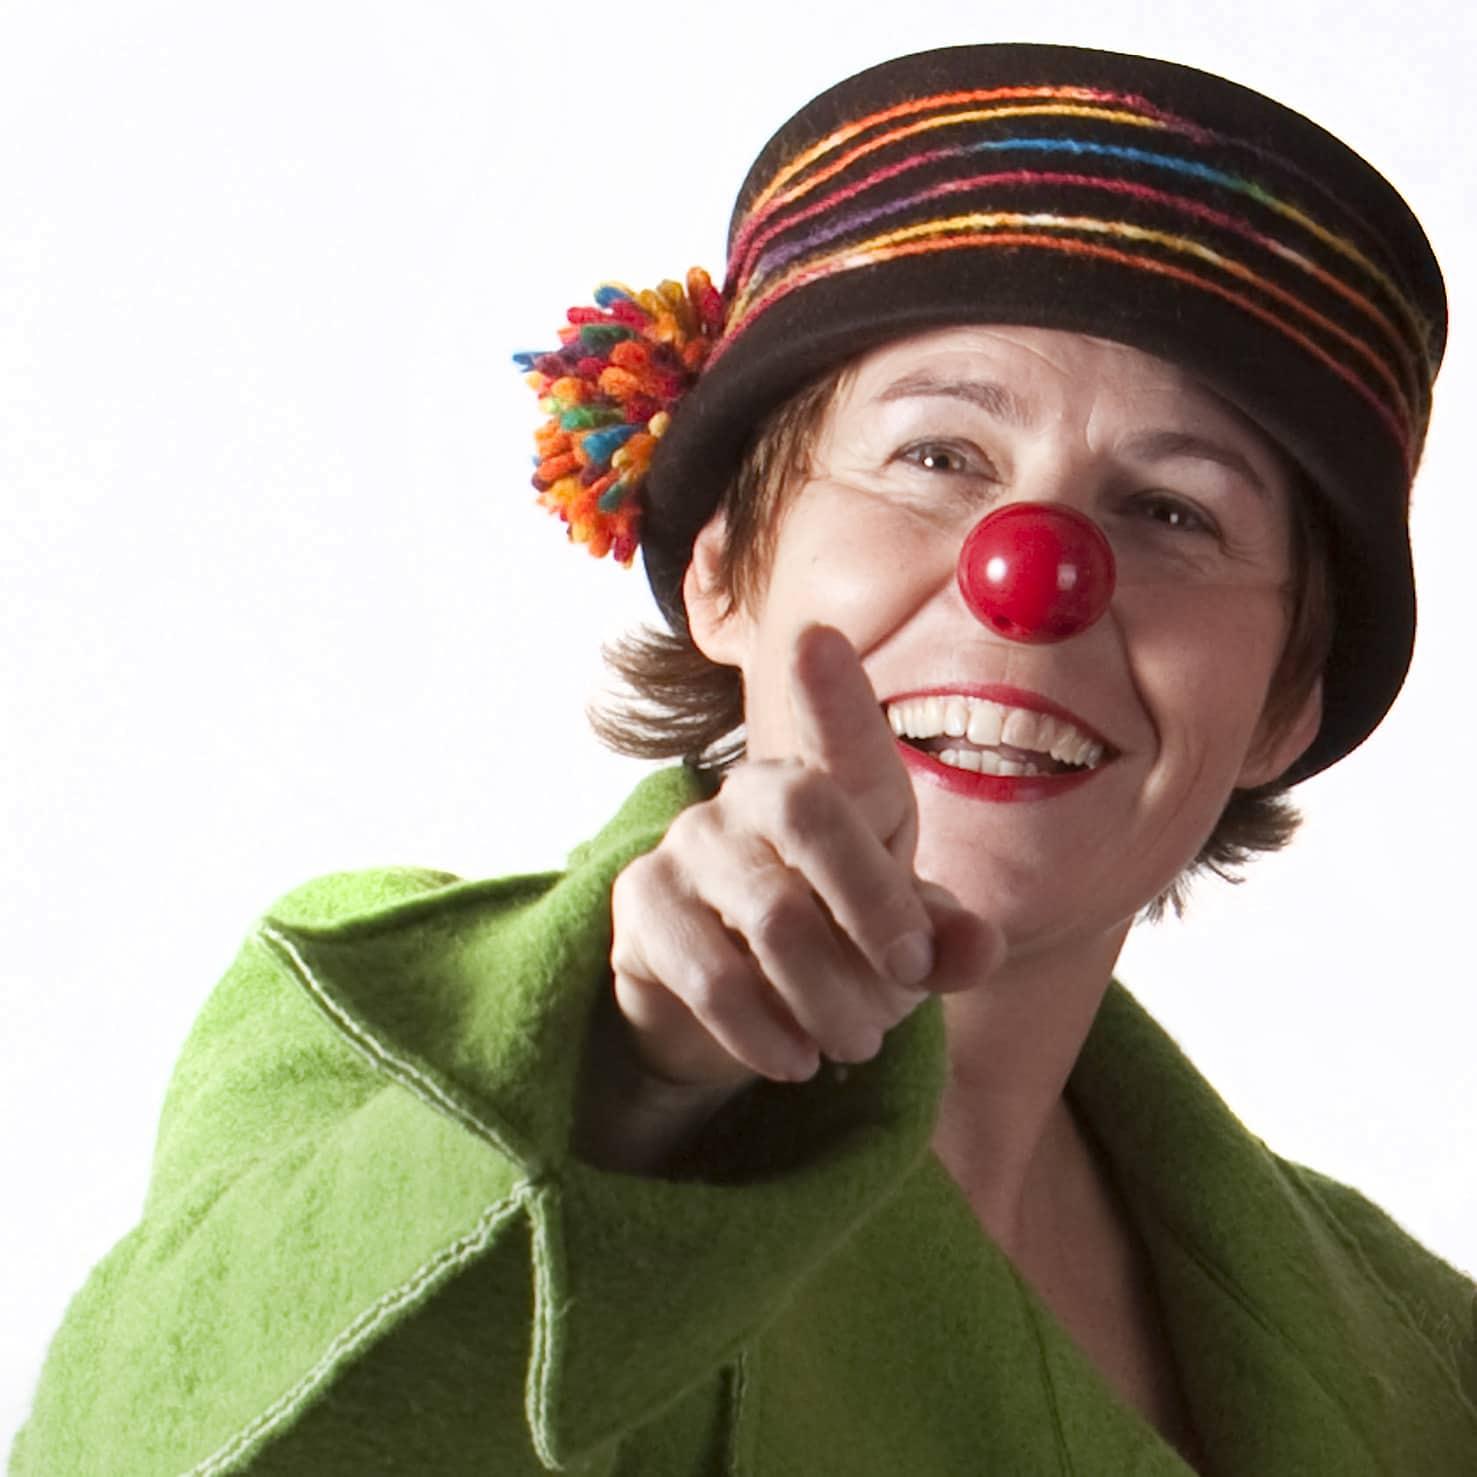 Clown Niekie MG 3925 ©Ariana Schroor 171109 - Clown Niekie